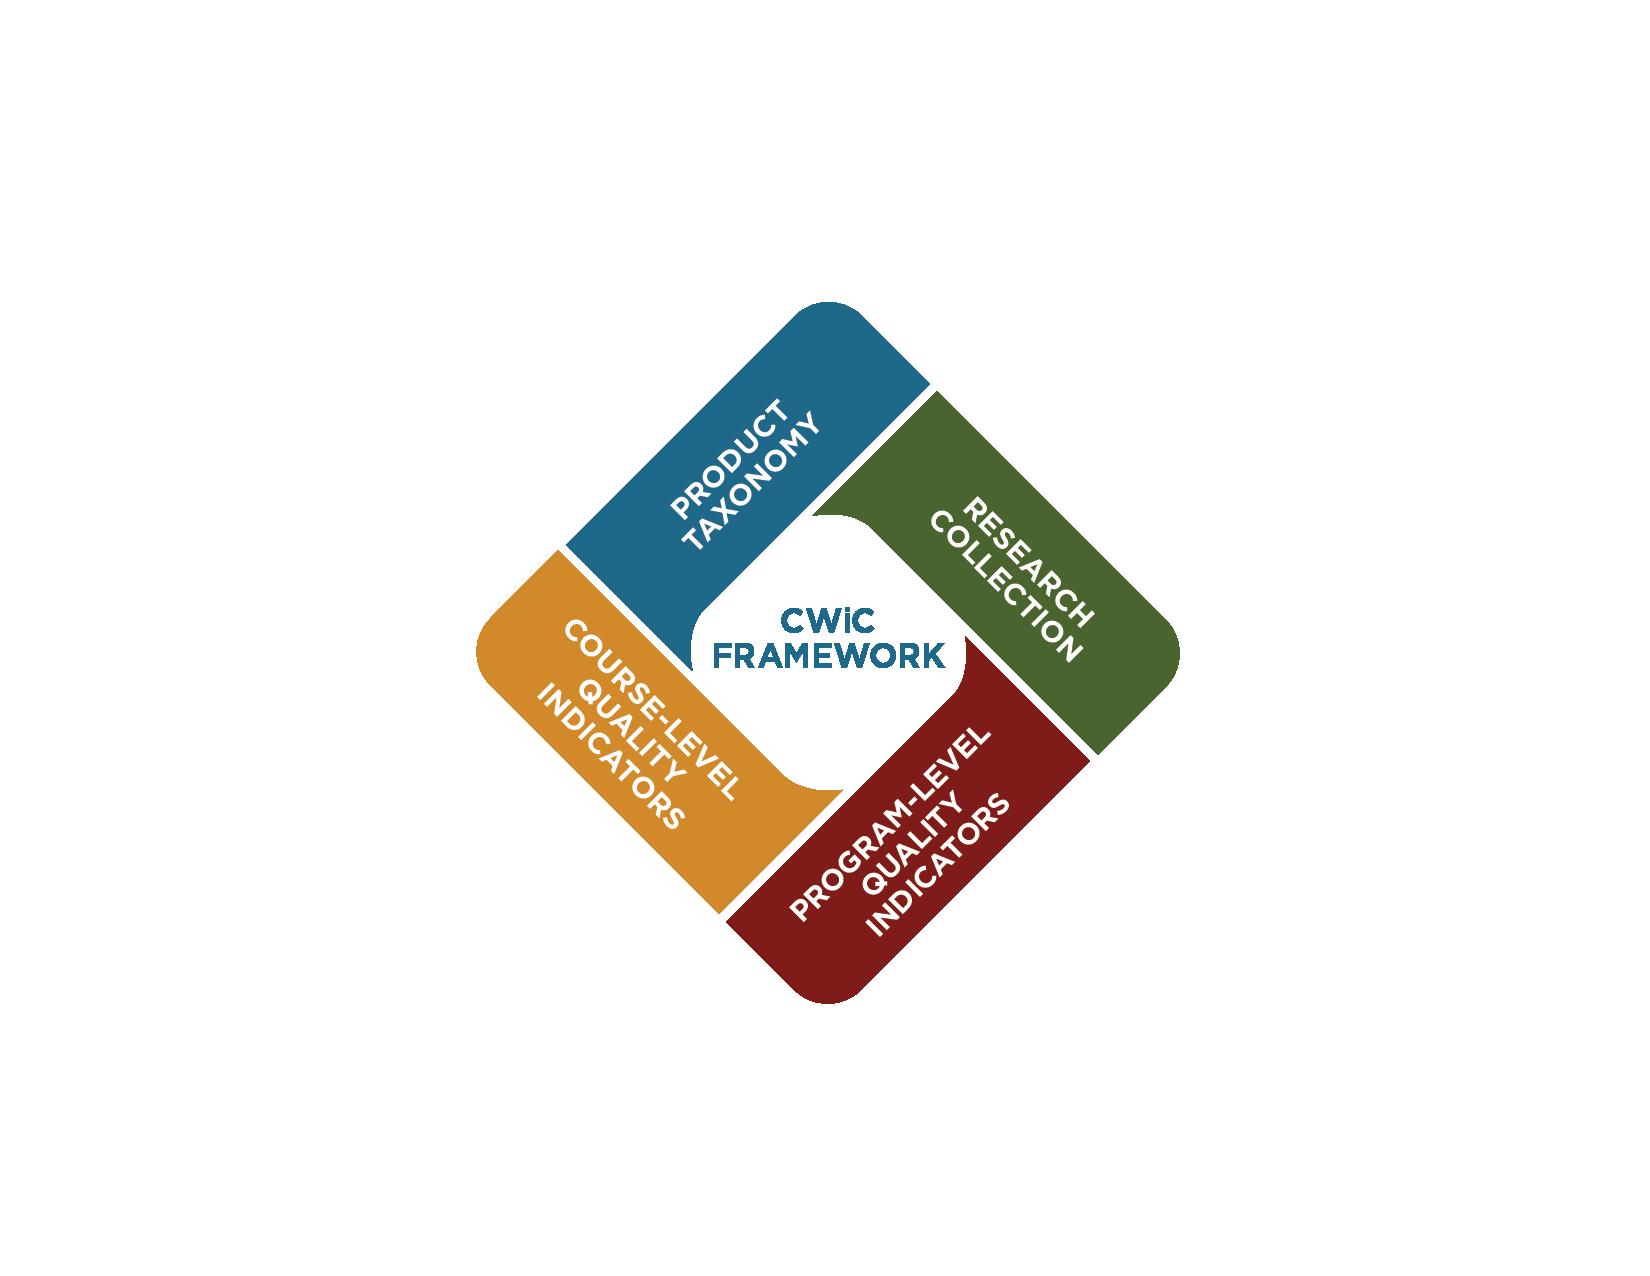 TYT070_CWiC_Framework_Upd_Rd1-06.png